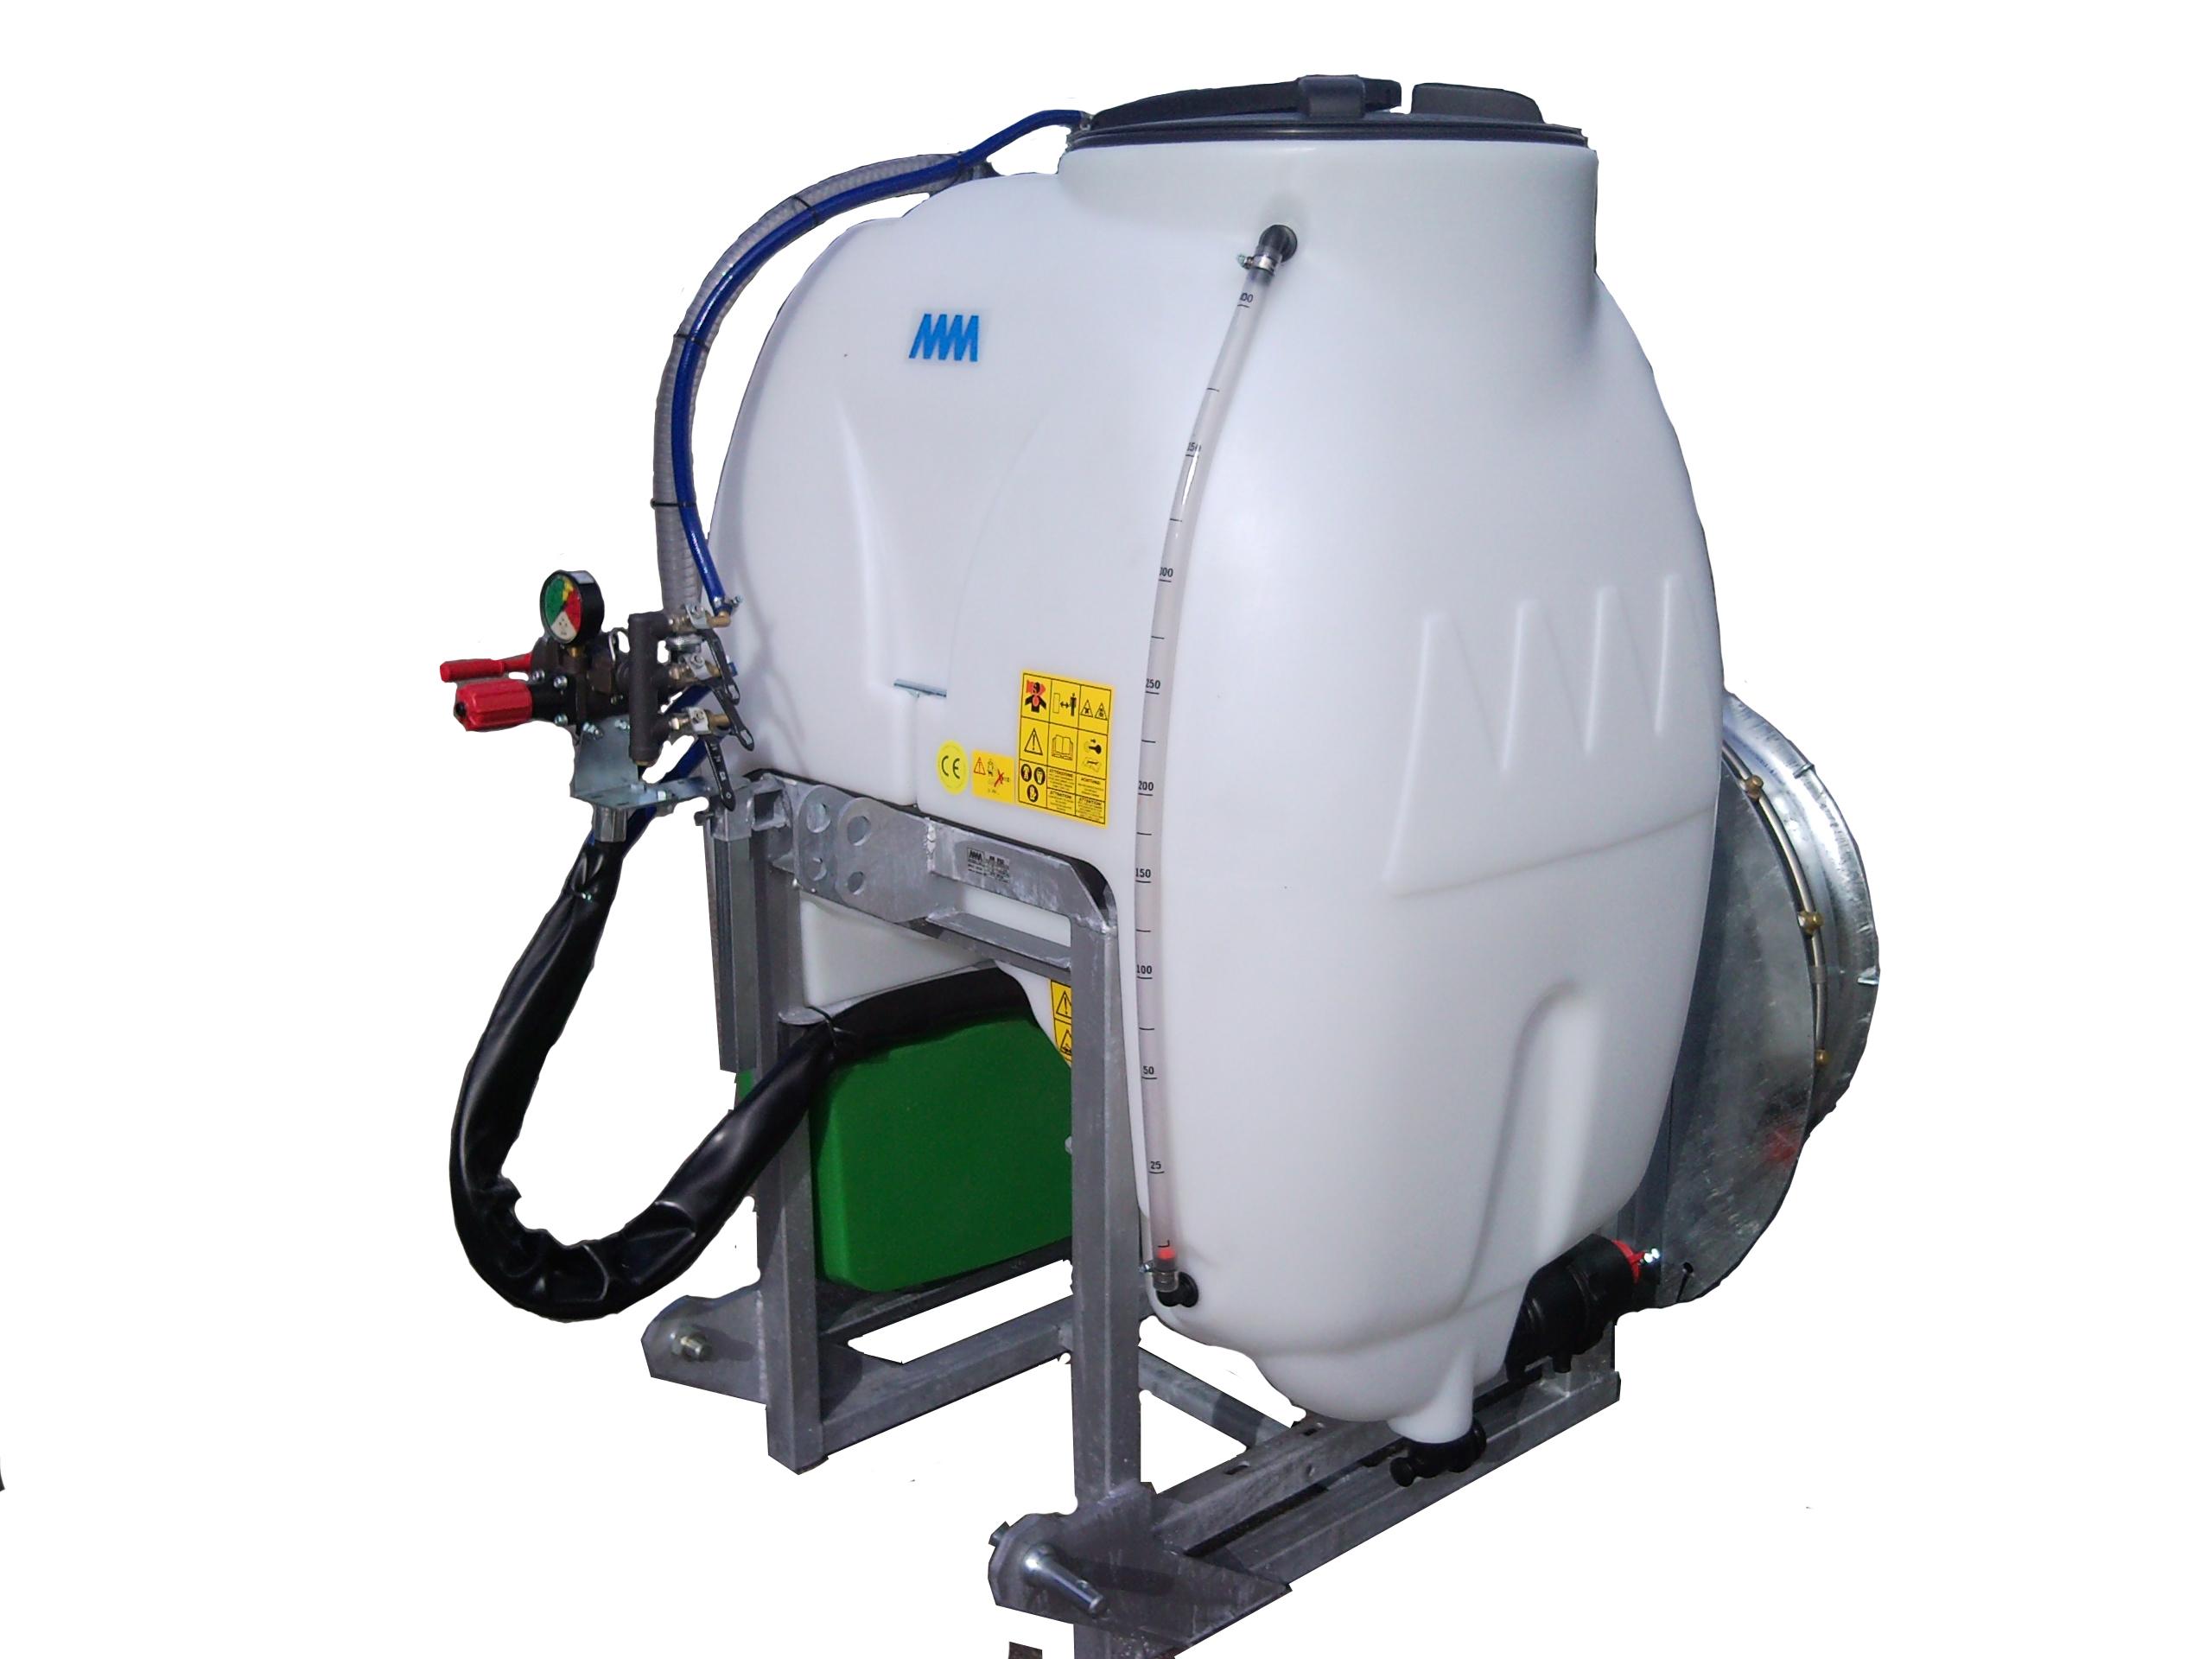 Tractor Pto Sprayer : Mm lg airblast sprayers pto usa